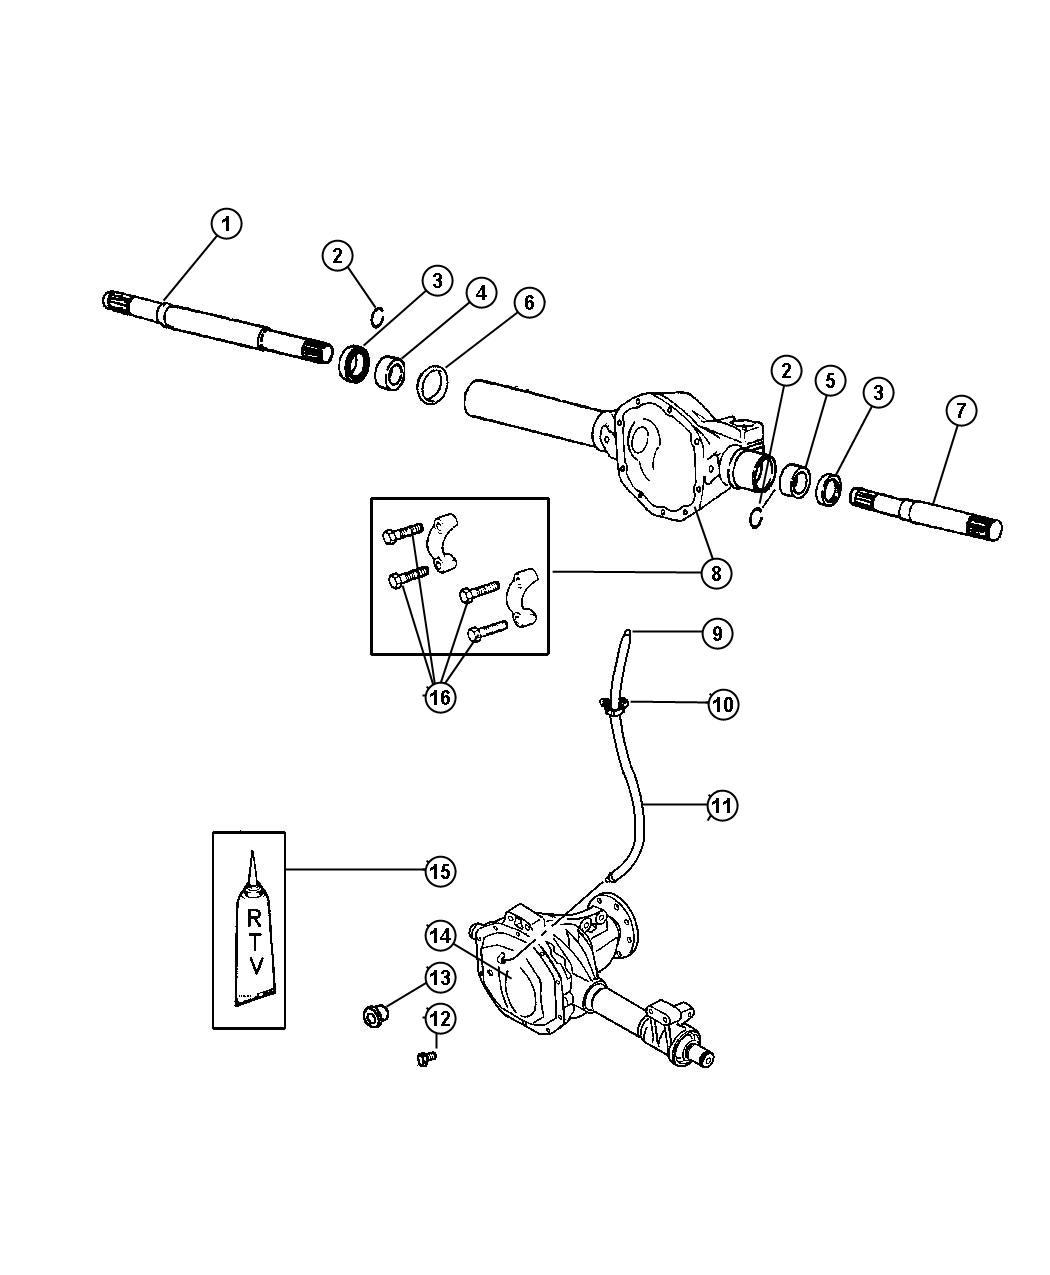 Dodge Dakota Clip. Vent tube. Mounting. Front axle vent